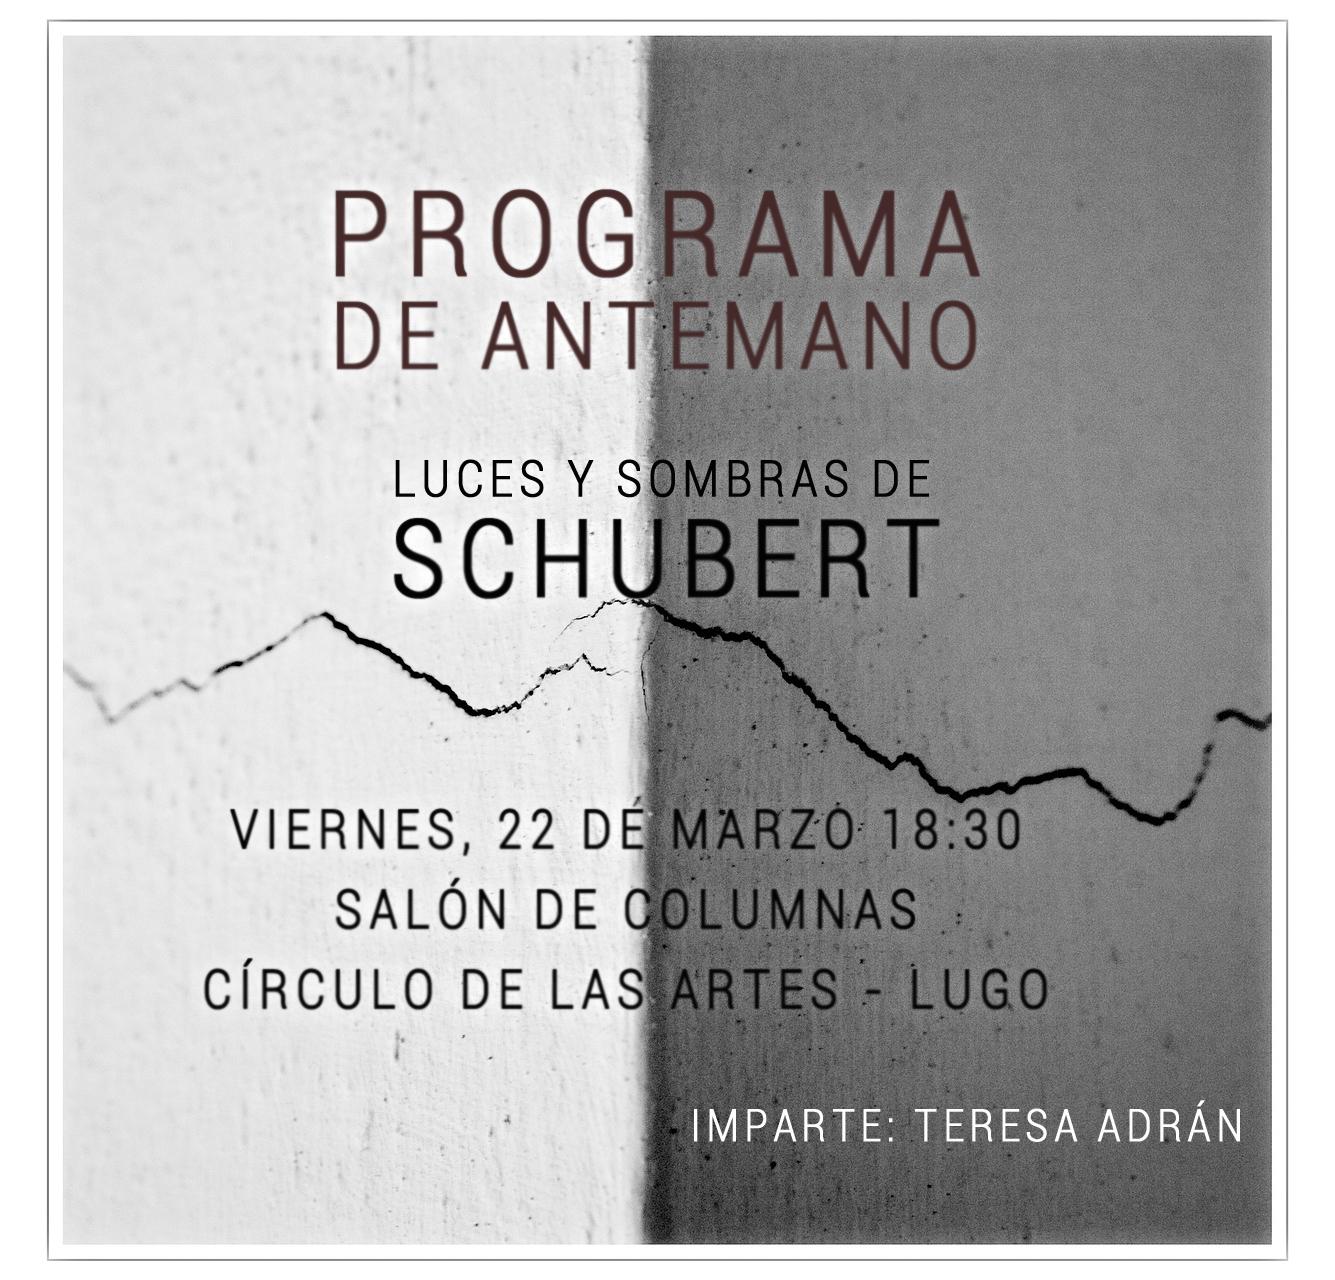 Programa de Antemano Schubert